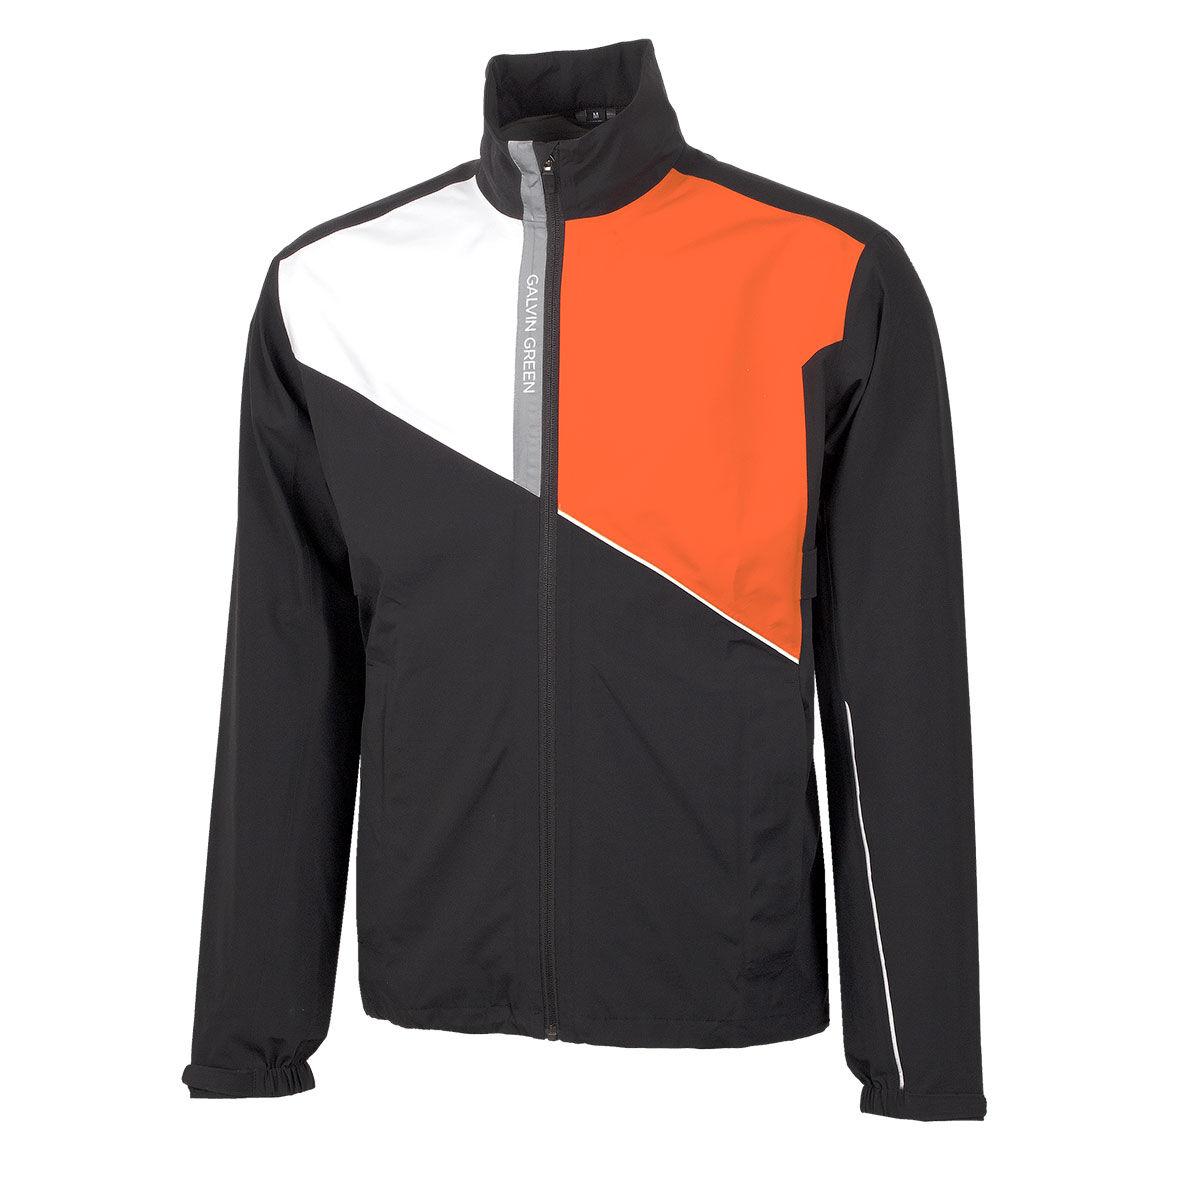 Galvin Green Apollo Golf Jacket, Mens, Black/white/red orange, Small   American Golf